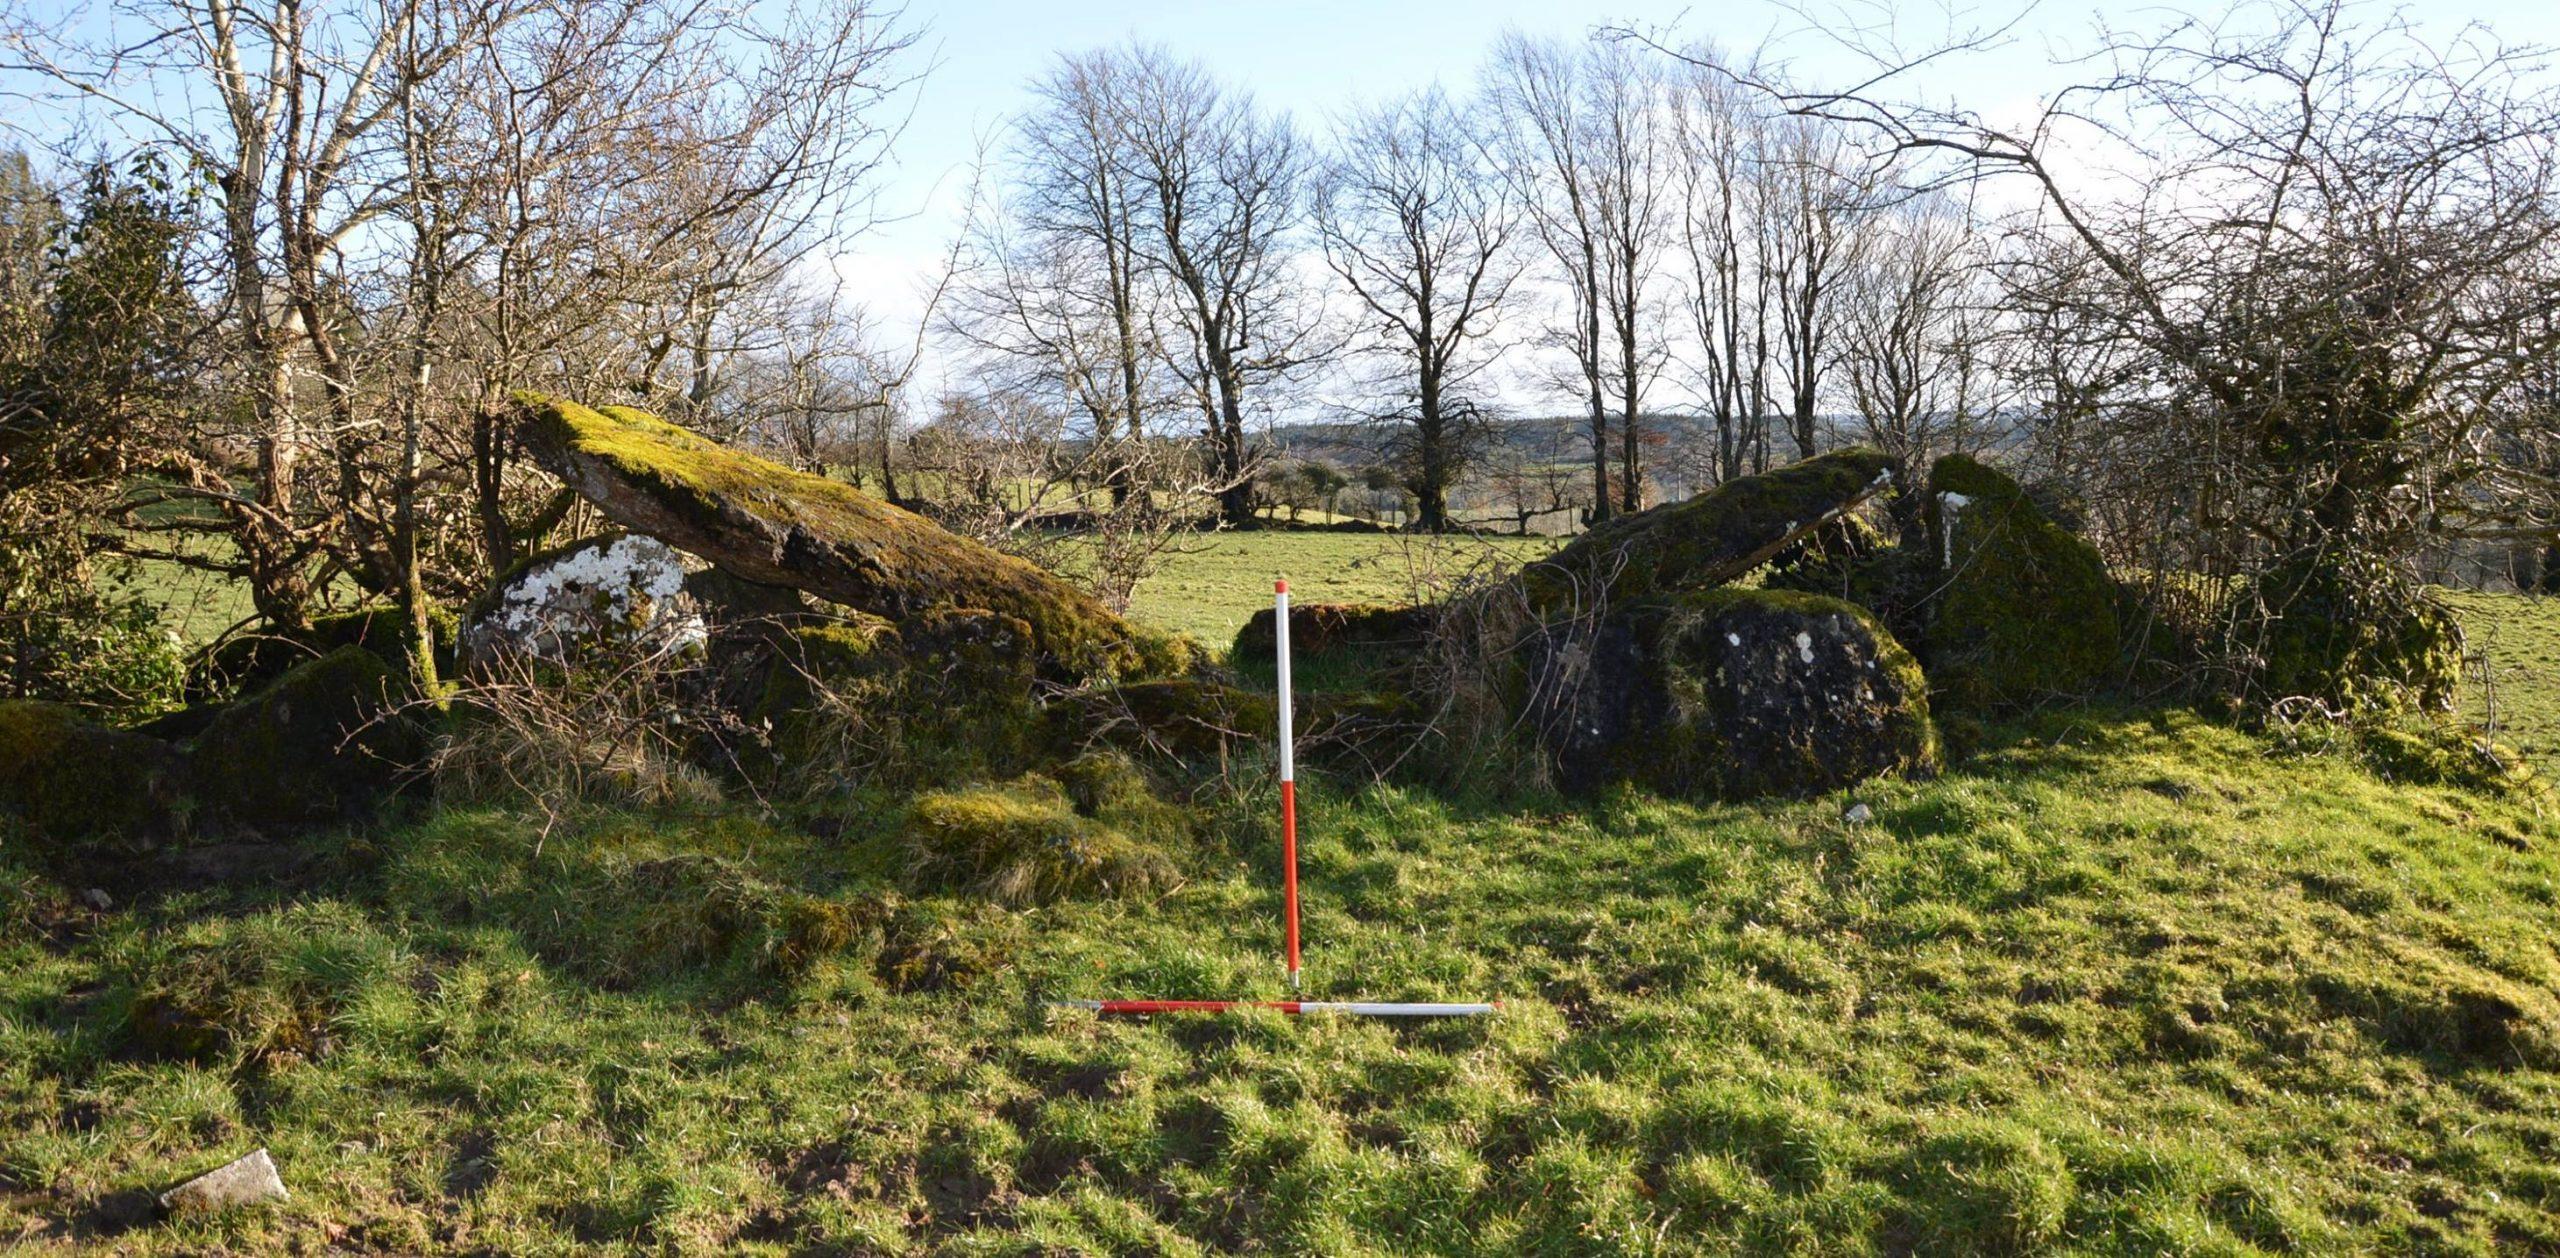 Marblehill Wedge Tombs Galway Ireland - Visit Galway